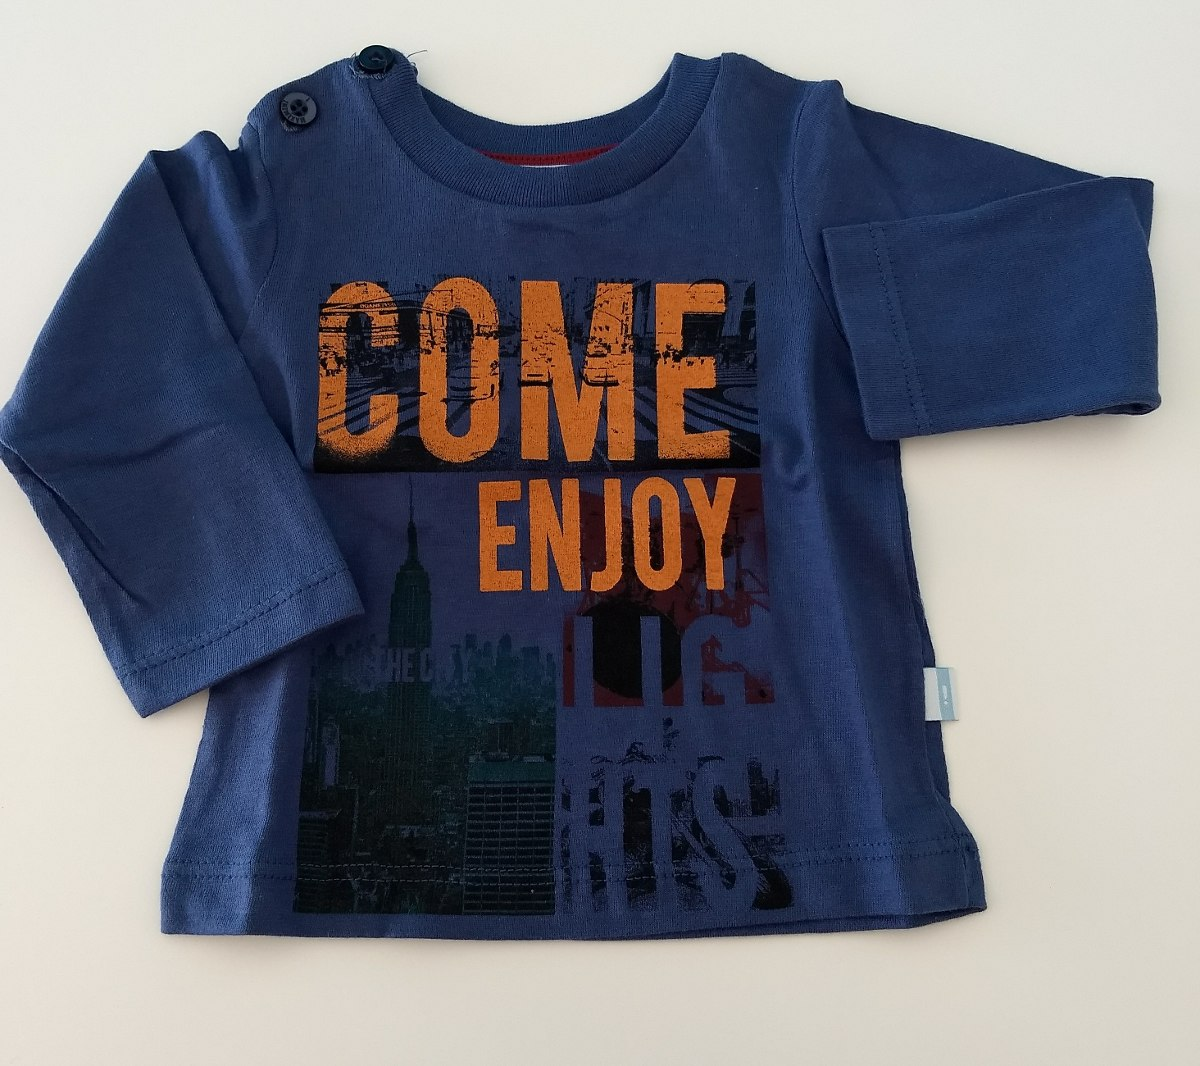 b6980565ea8 remera bebe recién nacido manga larga camiseta algodon varon. Cargando zoom.